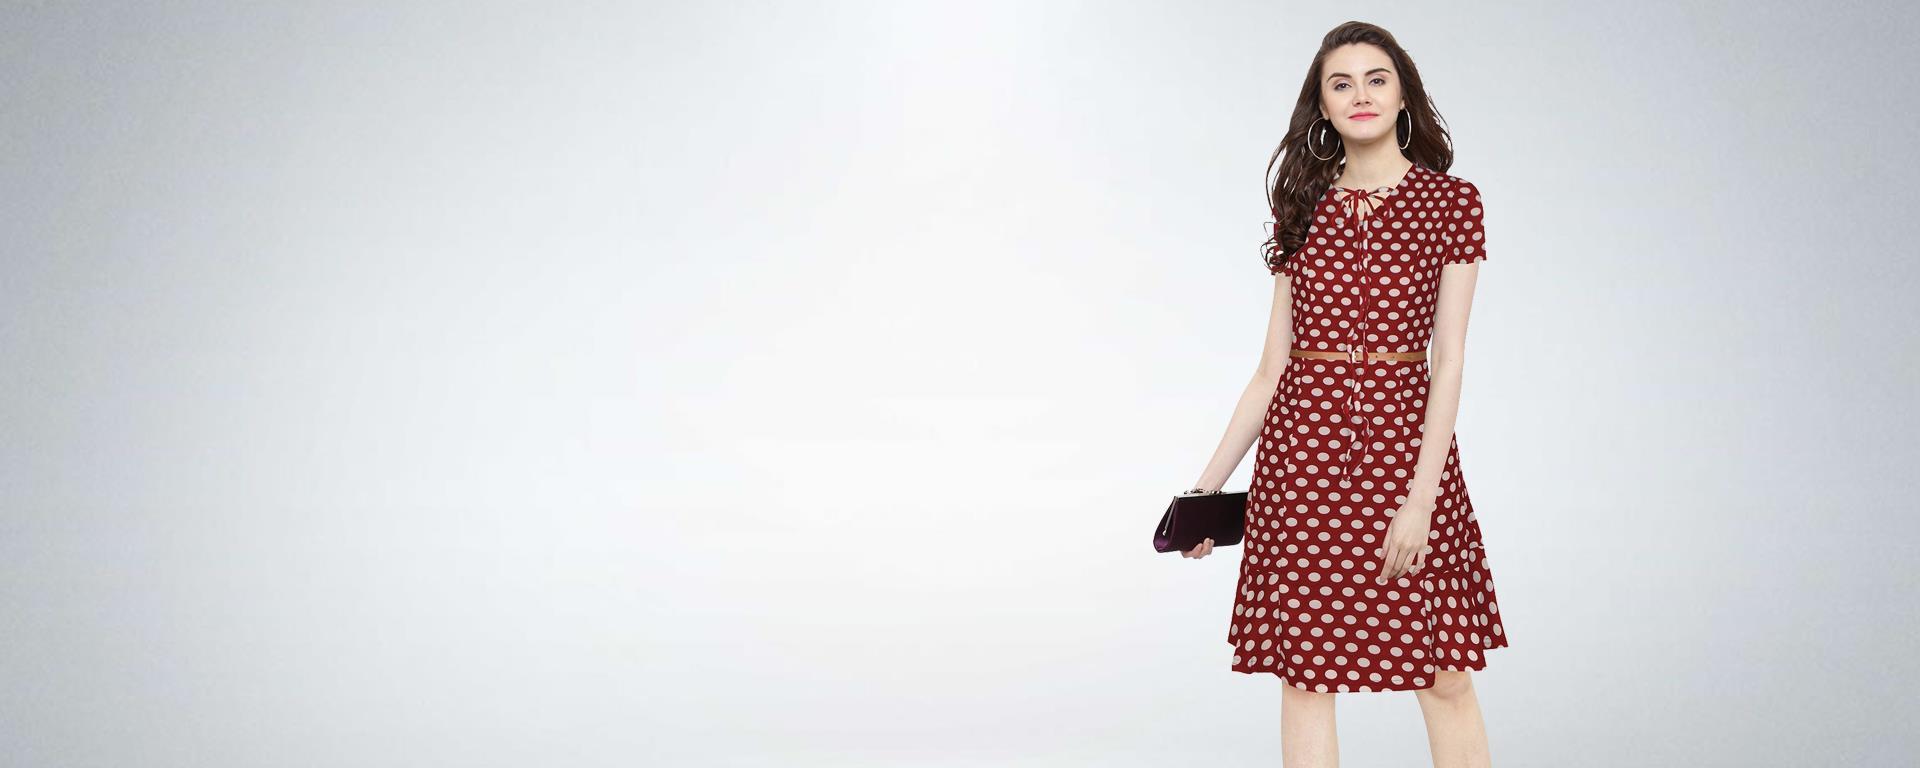 Special offer sale upto 80 off on zyla fashion